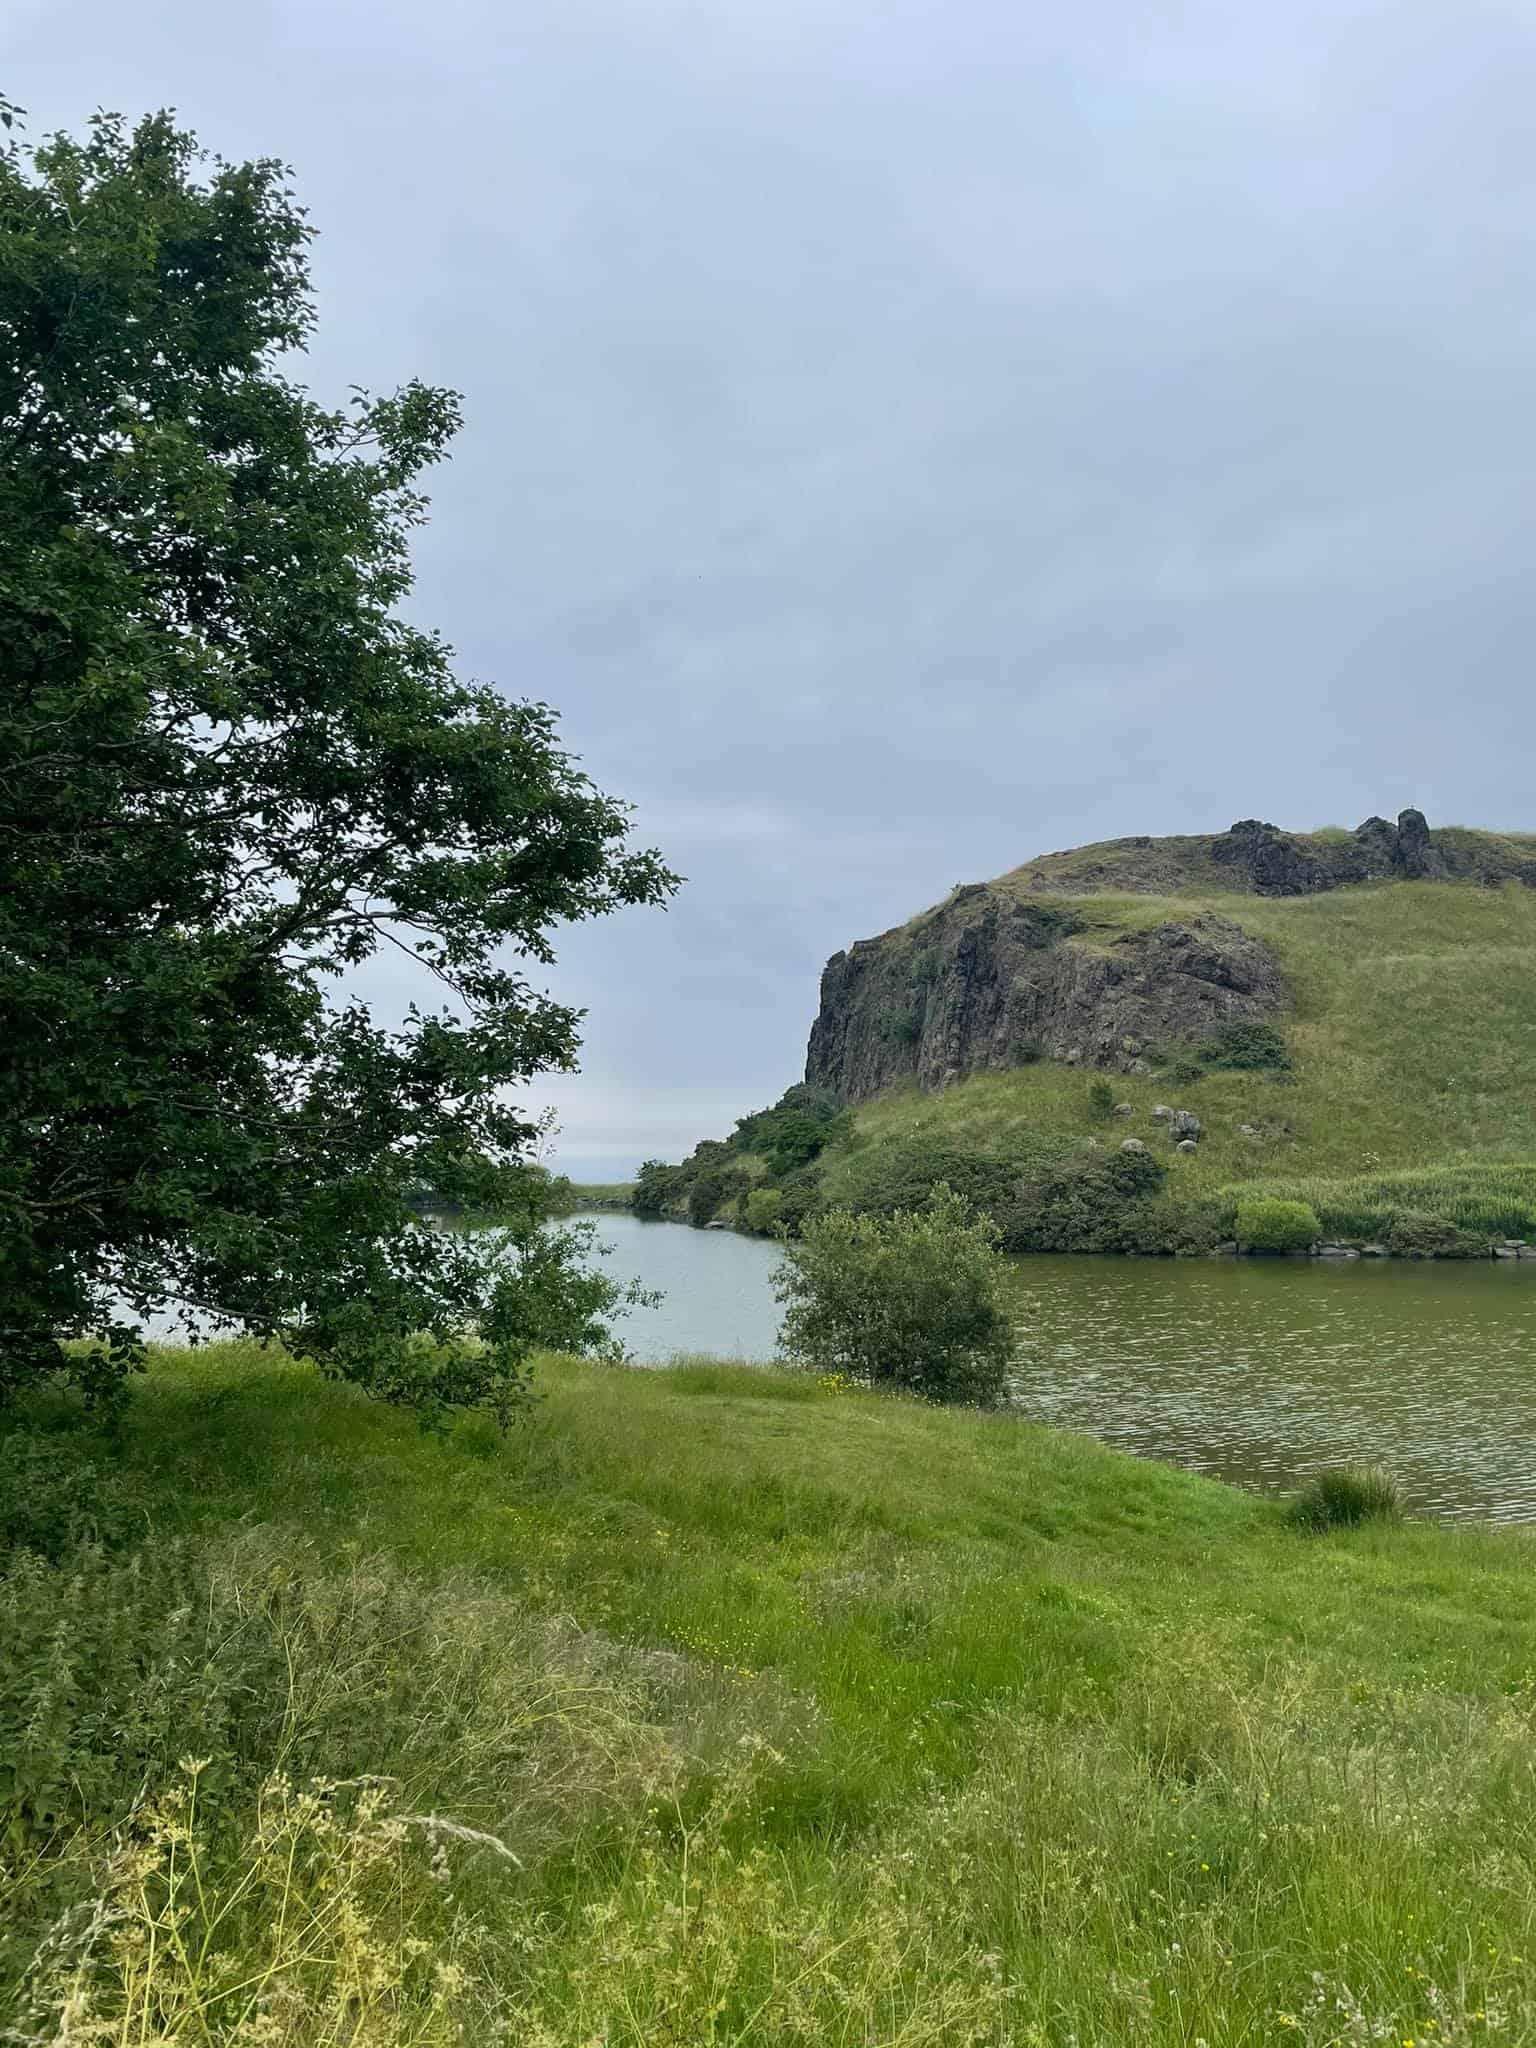 Edinburgh itinerary: Holyrood Park